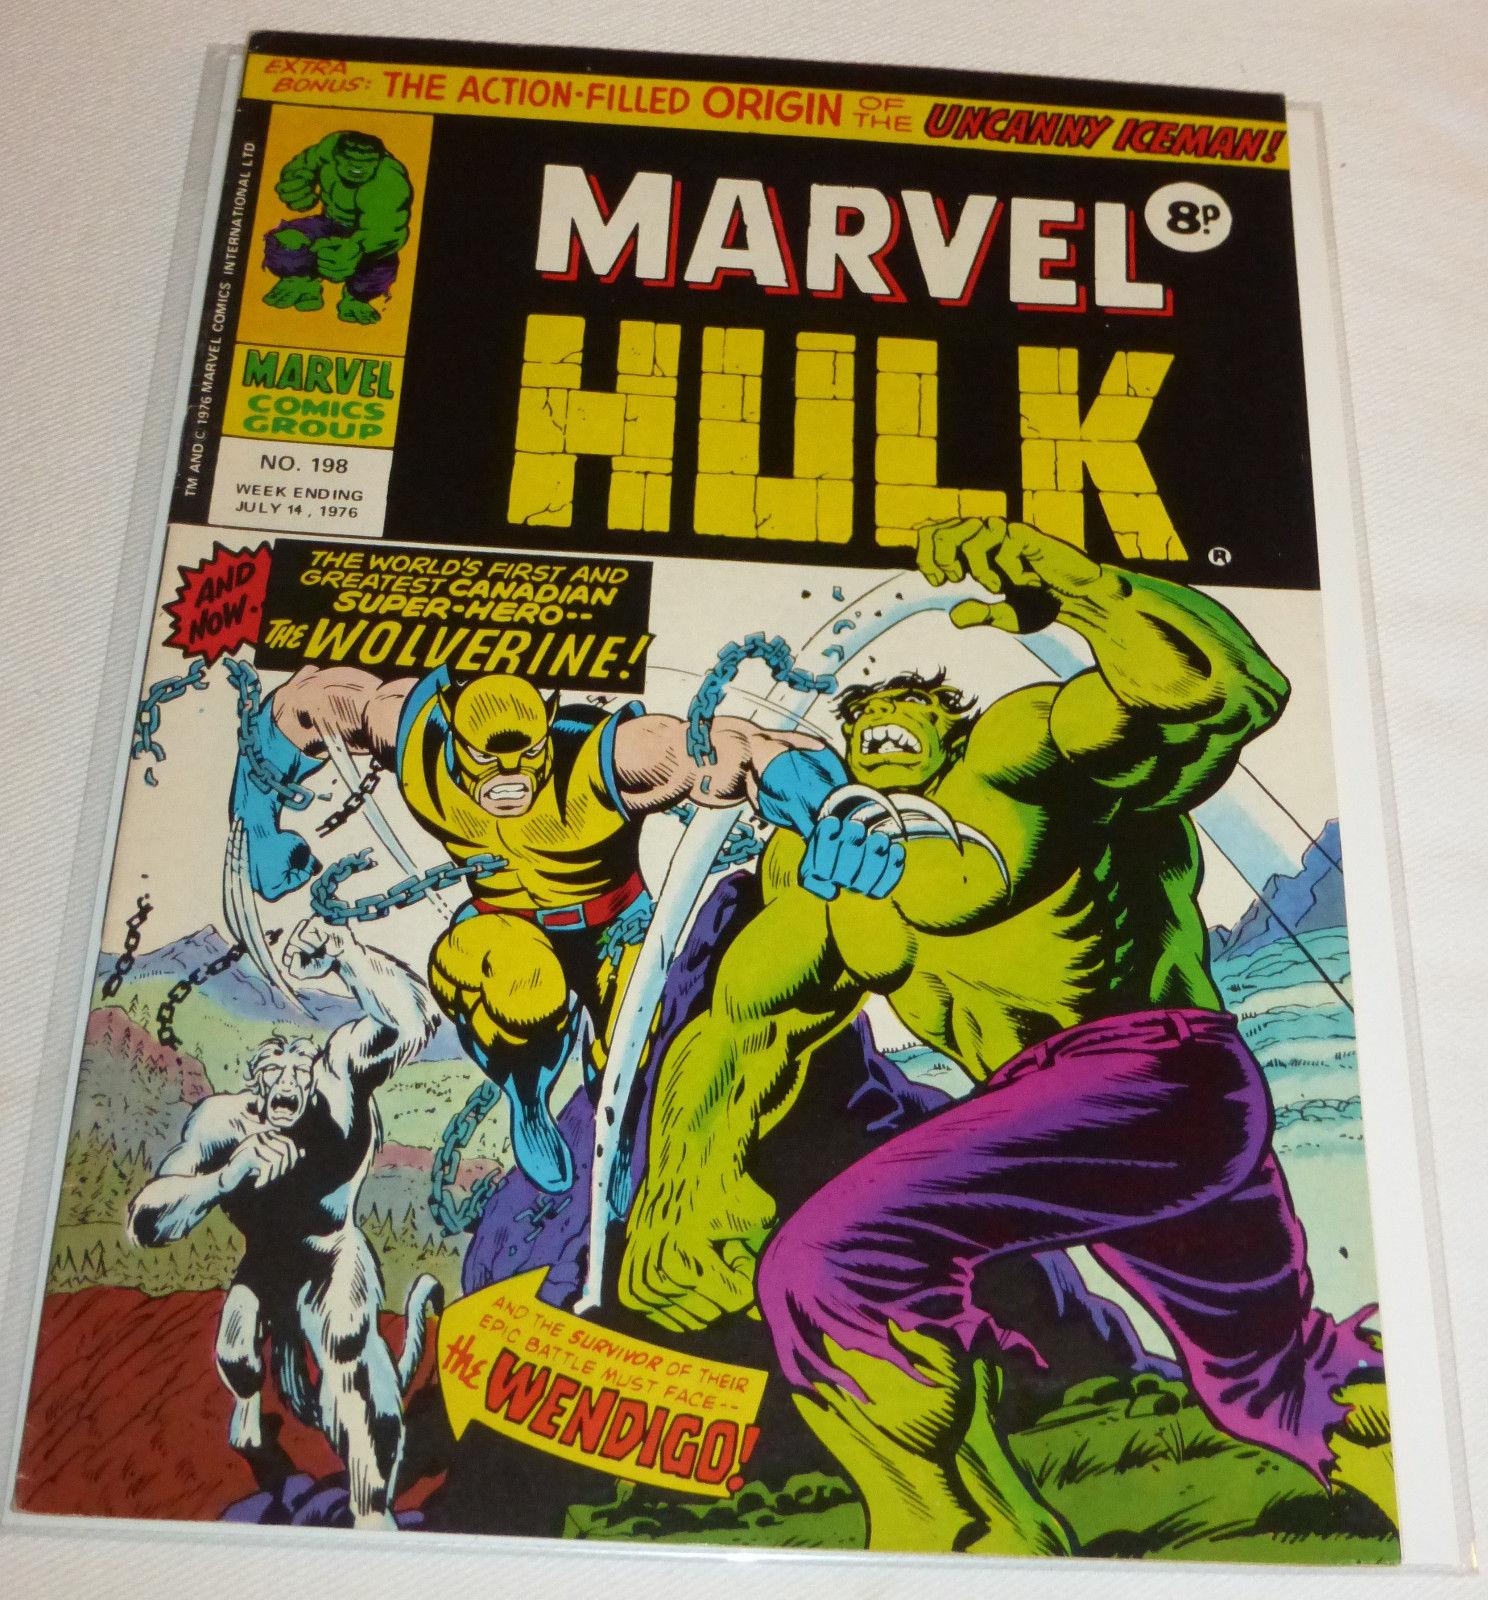 Mighty World of Marvel #197 & 198, UK Incredible Hulk 180 & 181 set